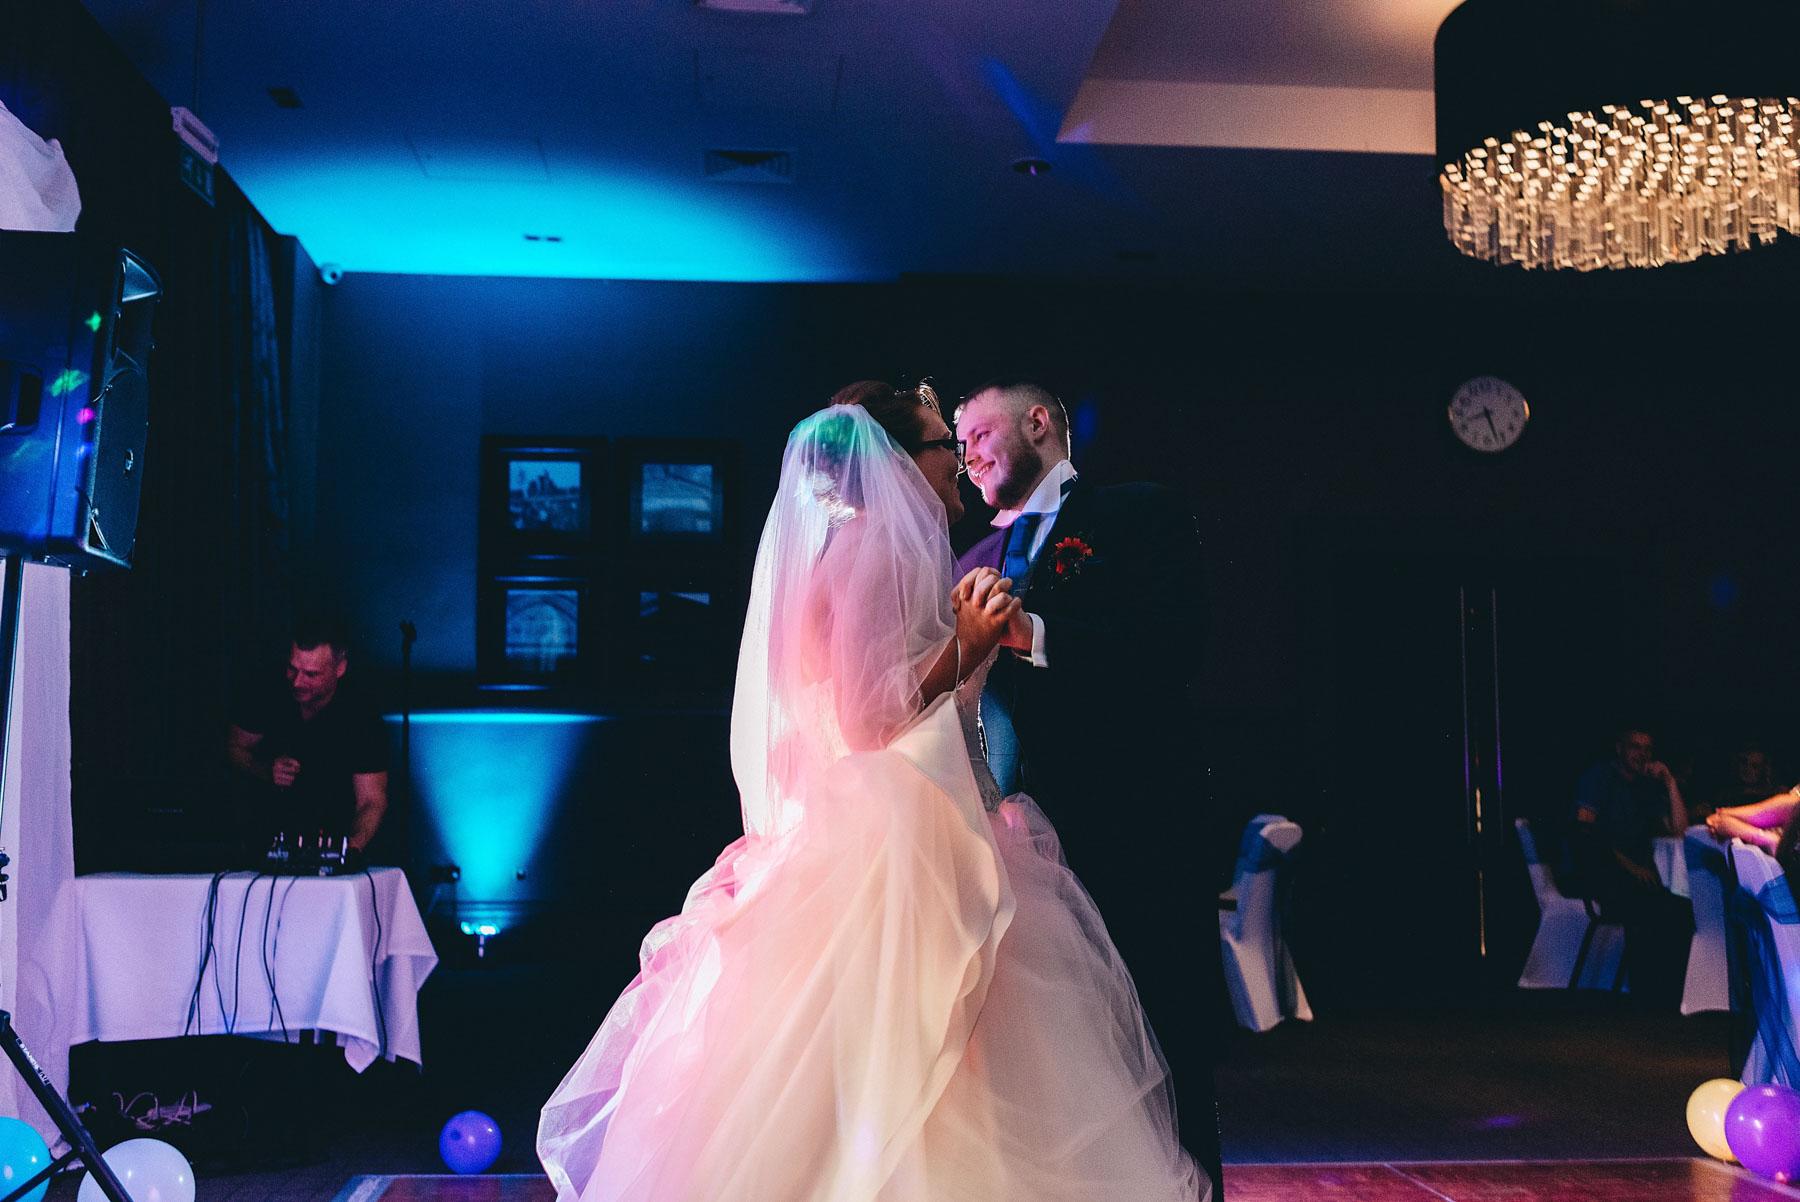 First dance during wedding reception at Village hotel Ashton